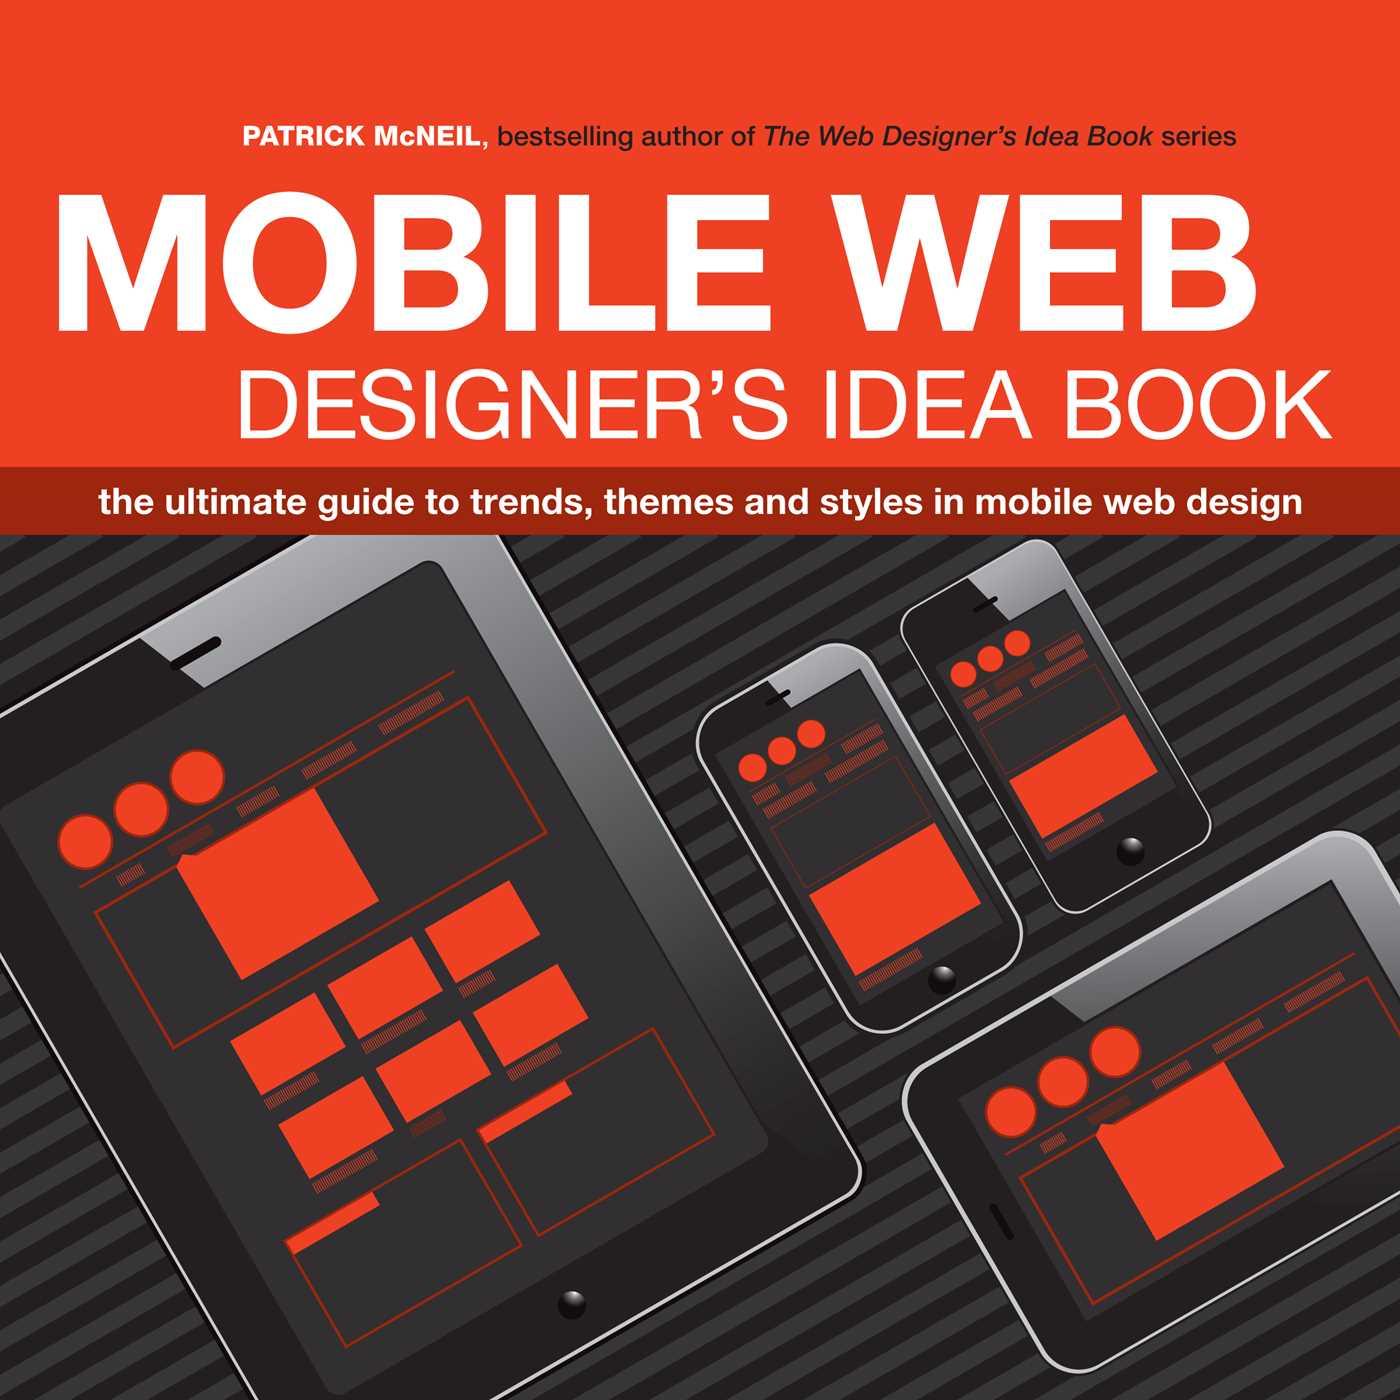 Mobile web designer 39 s idea book book by patrick mcneil for Designer s image